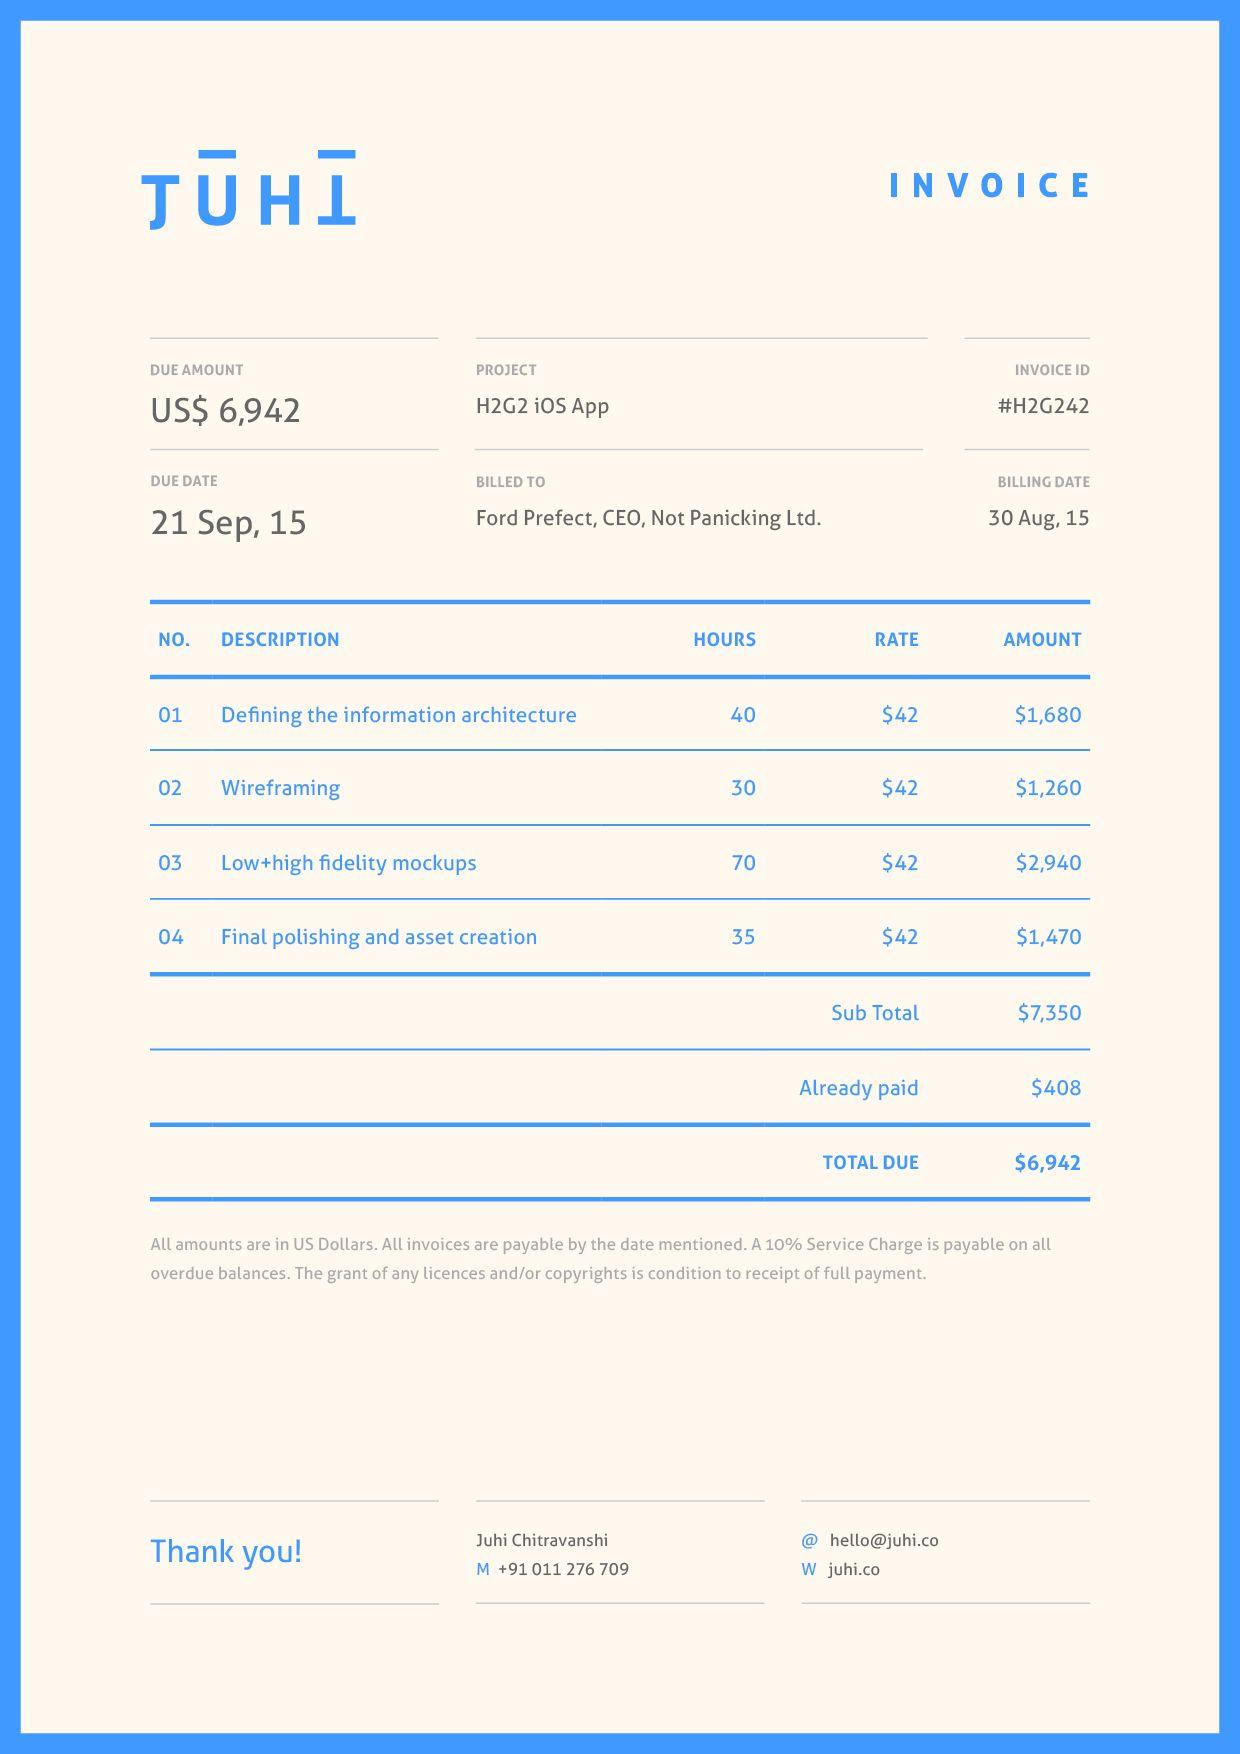 juhi chitravanshi invoice modern bright colorful minimal invoice